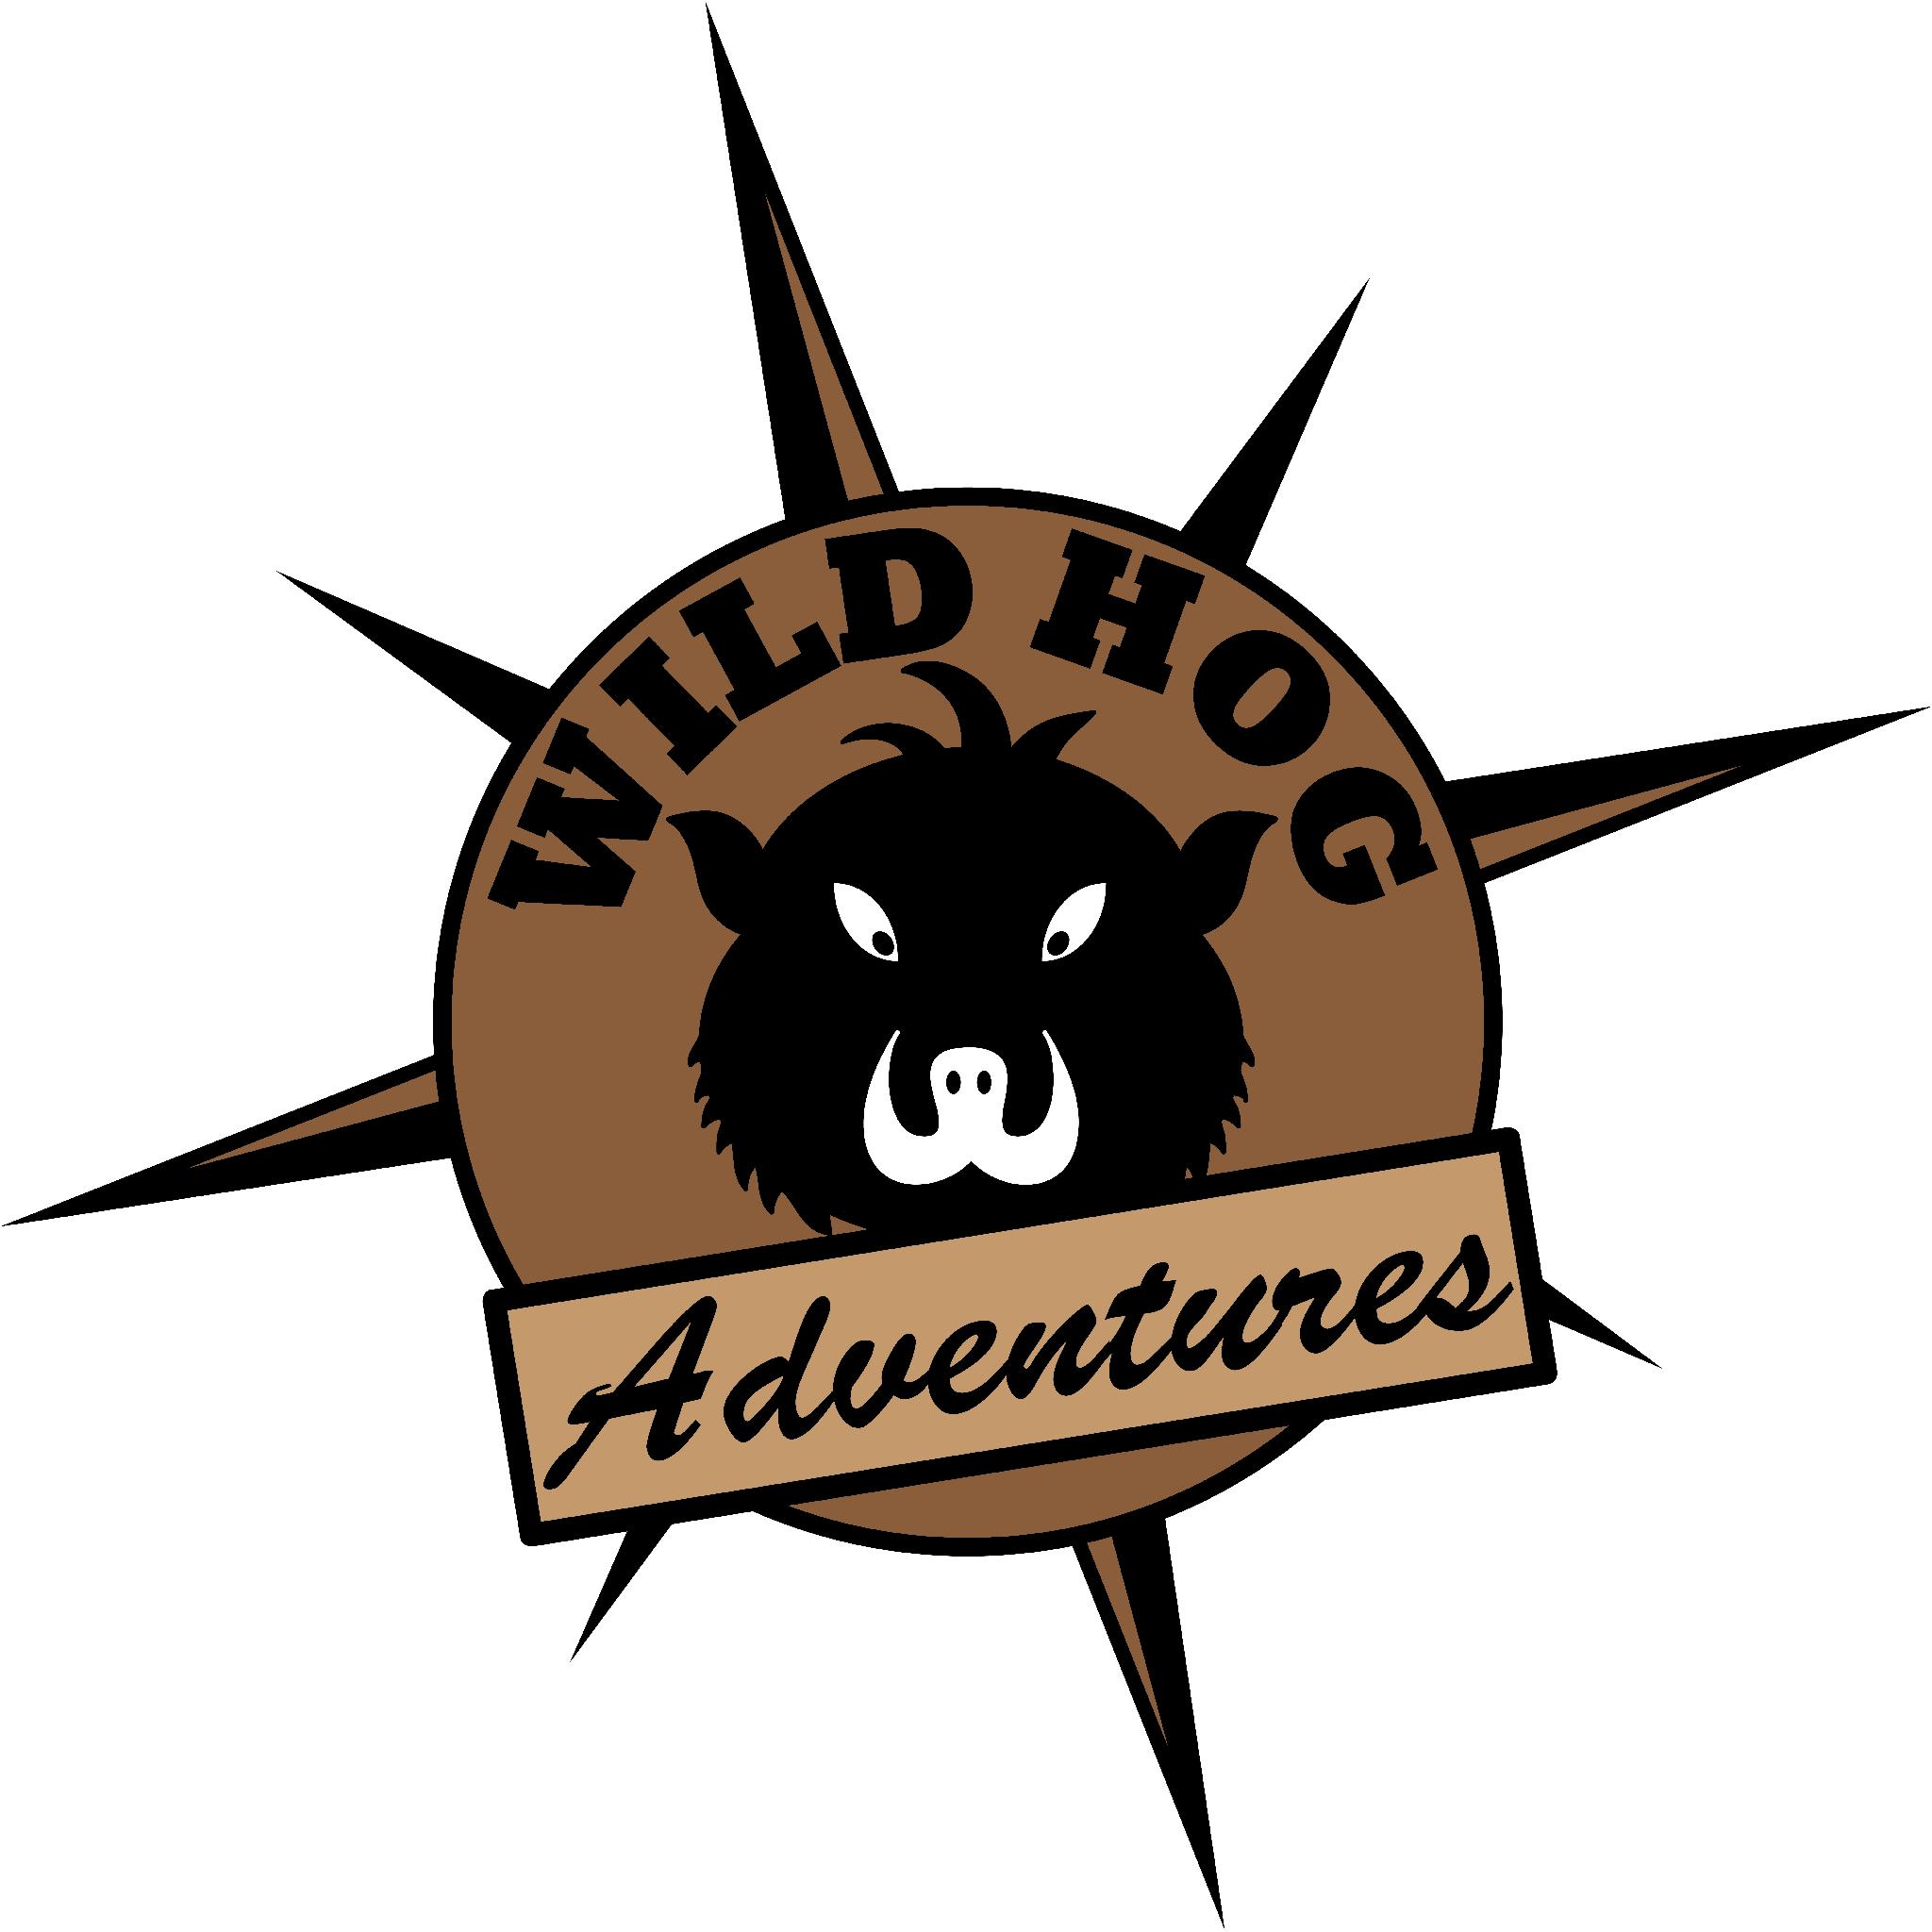 Wild HOG Adventures